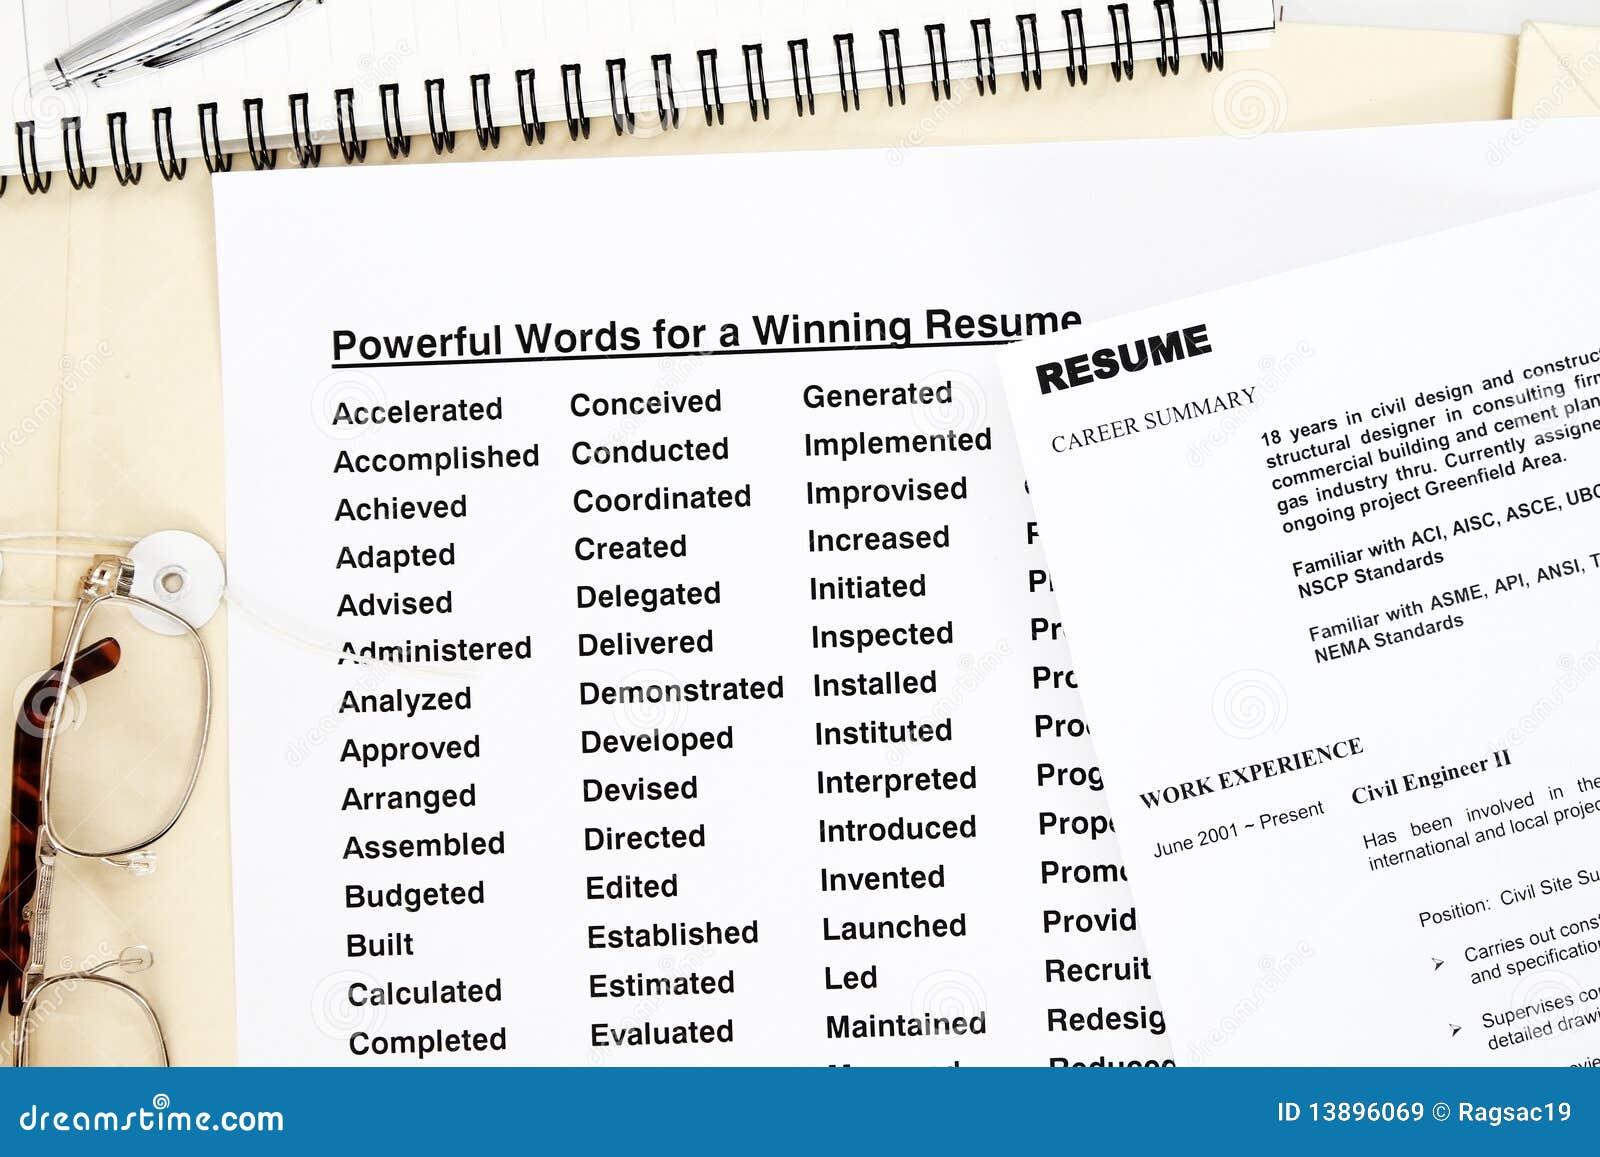 Powerful words resume stock image. Image of close, human - 13896069